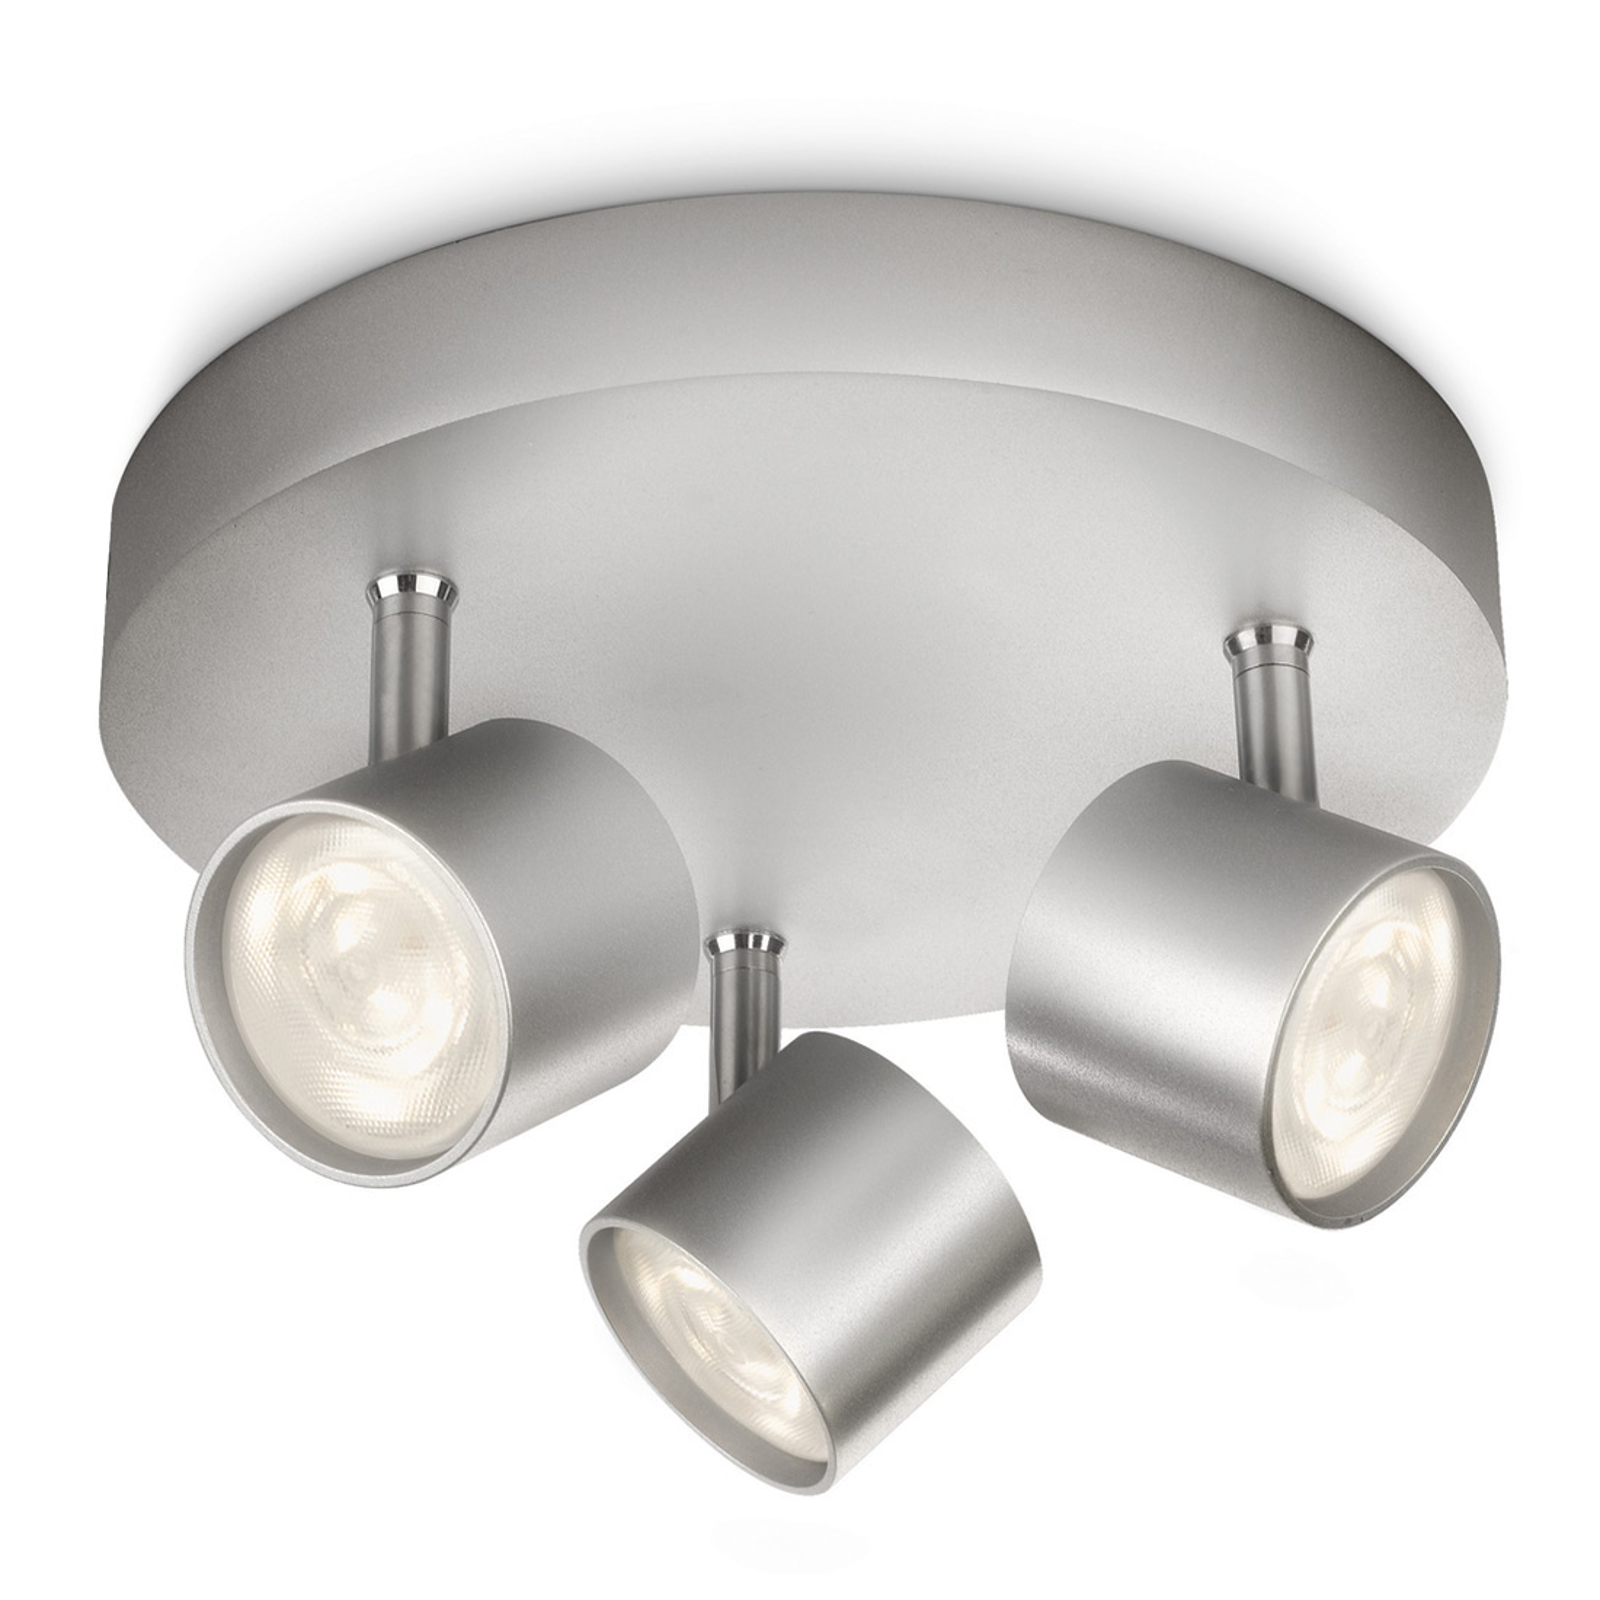 Ronde LED-plafondlamp Star, 3-lichts, zwenkbaar